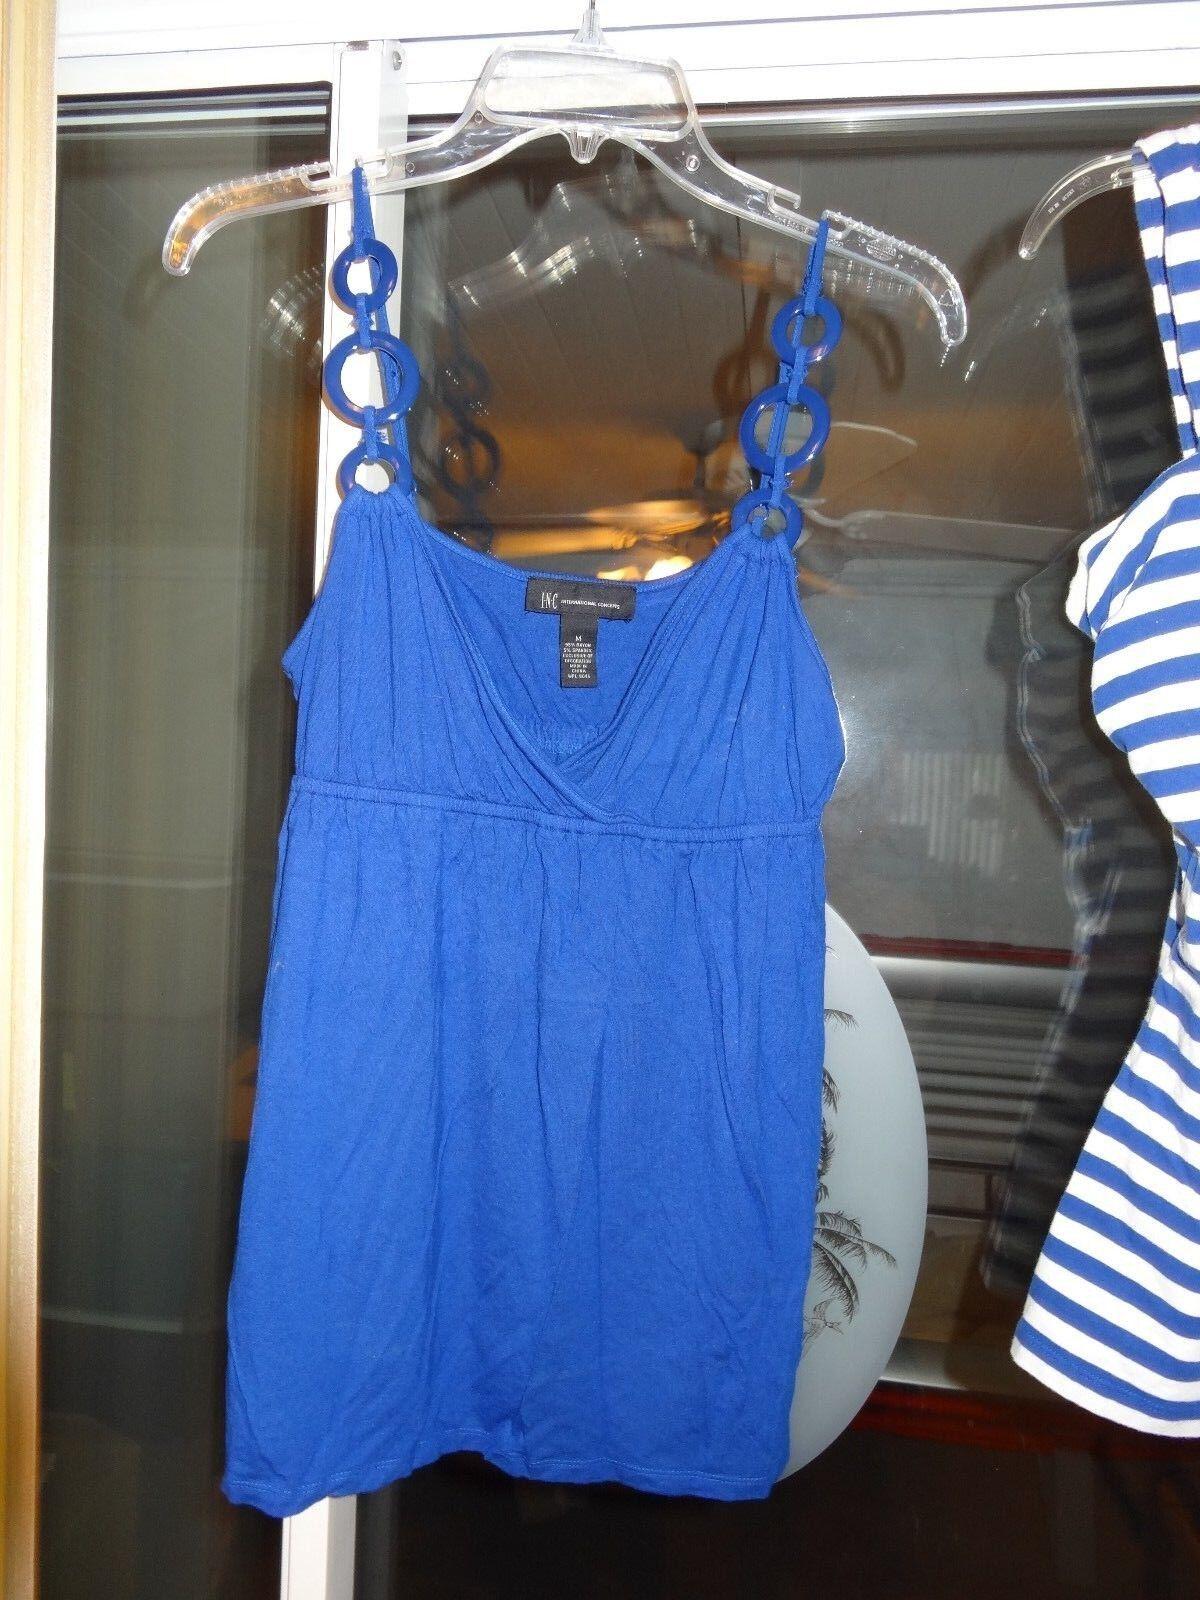 INC INTERNATIONAL CONCEPTS Sleeveless Top Royal Blau Größe Medium